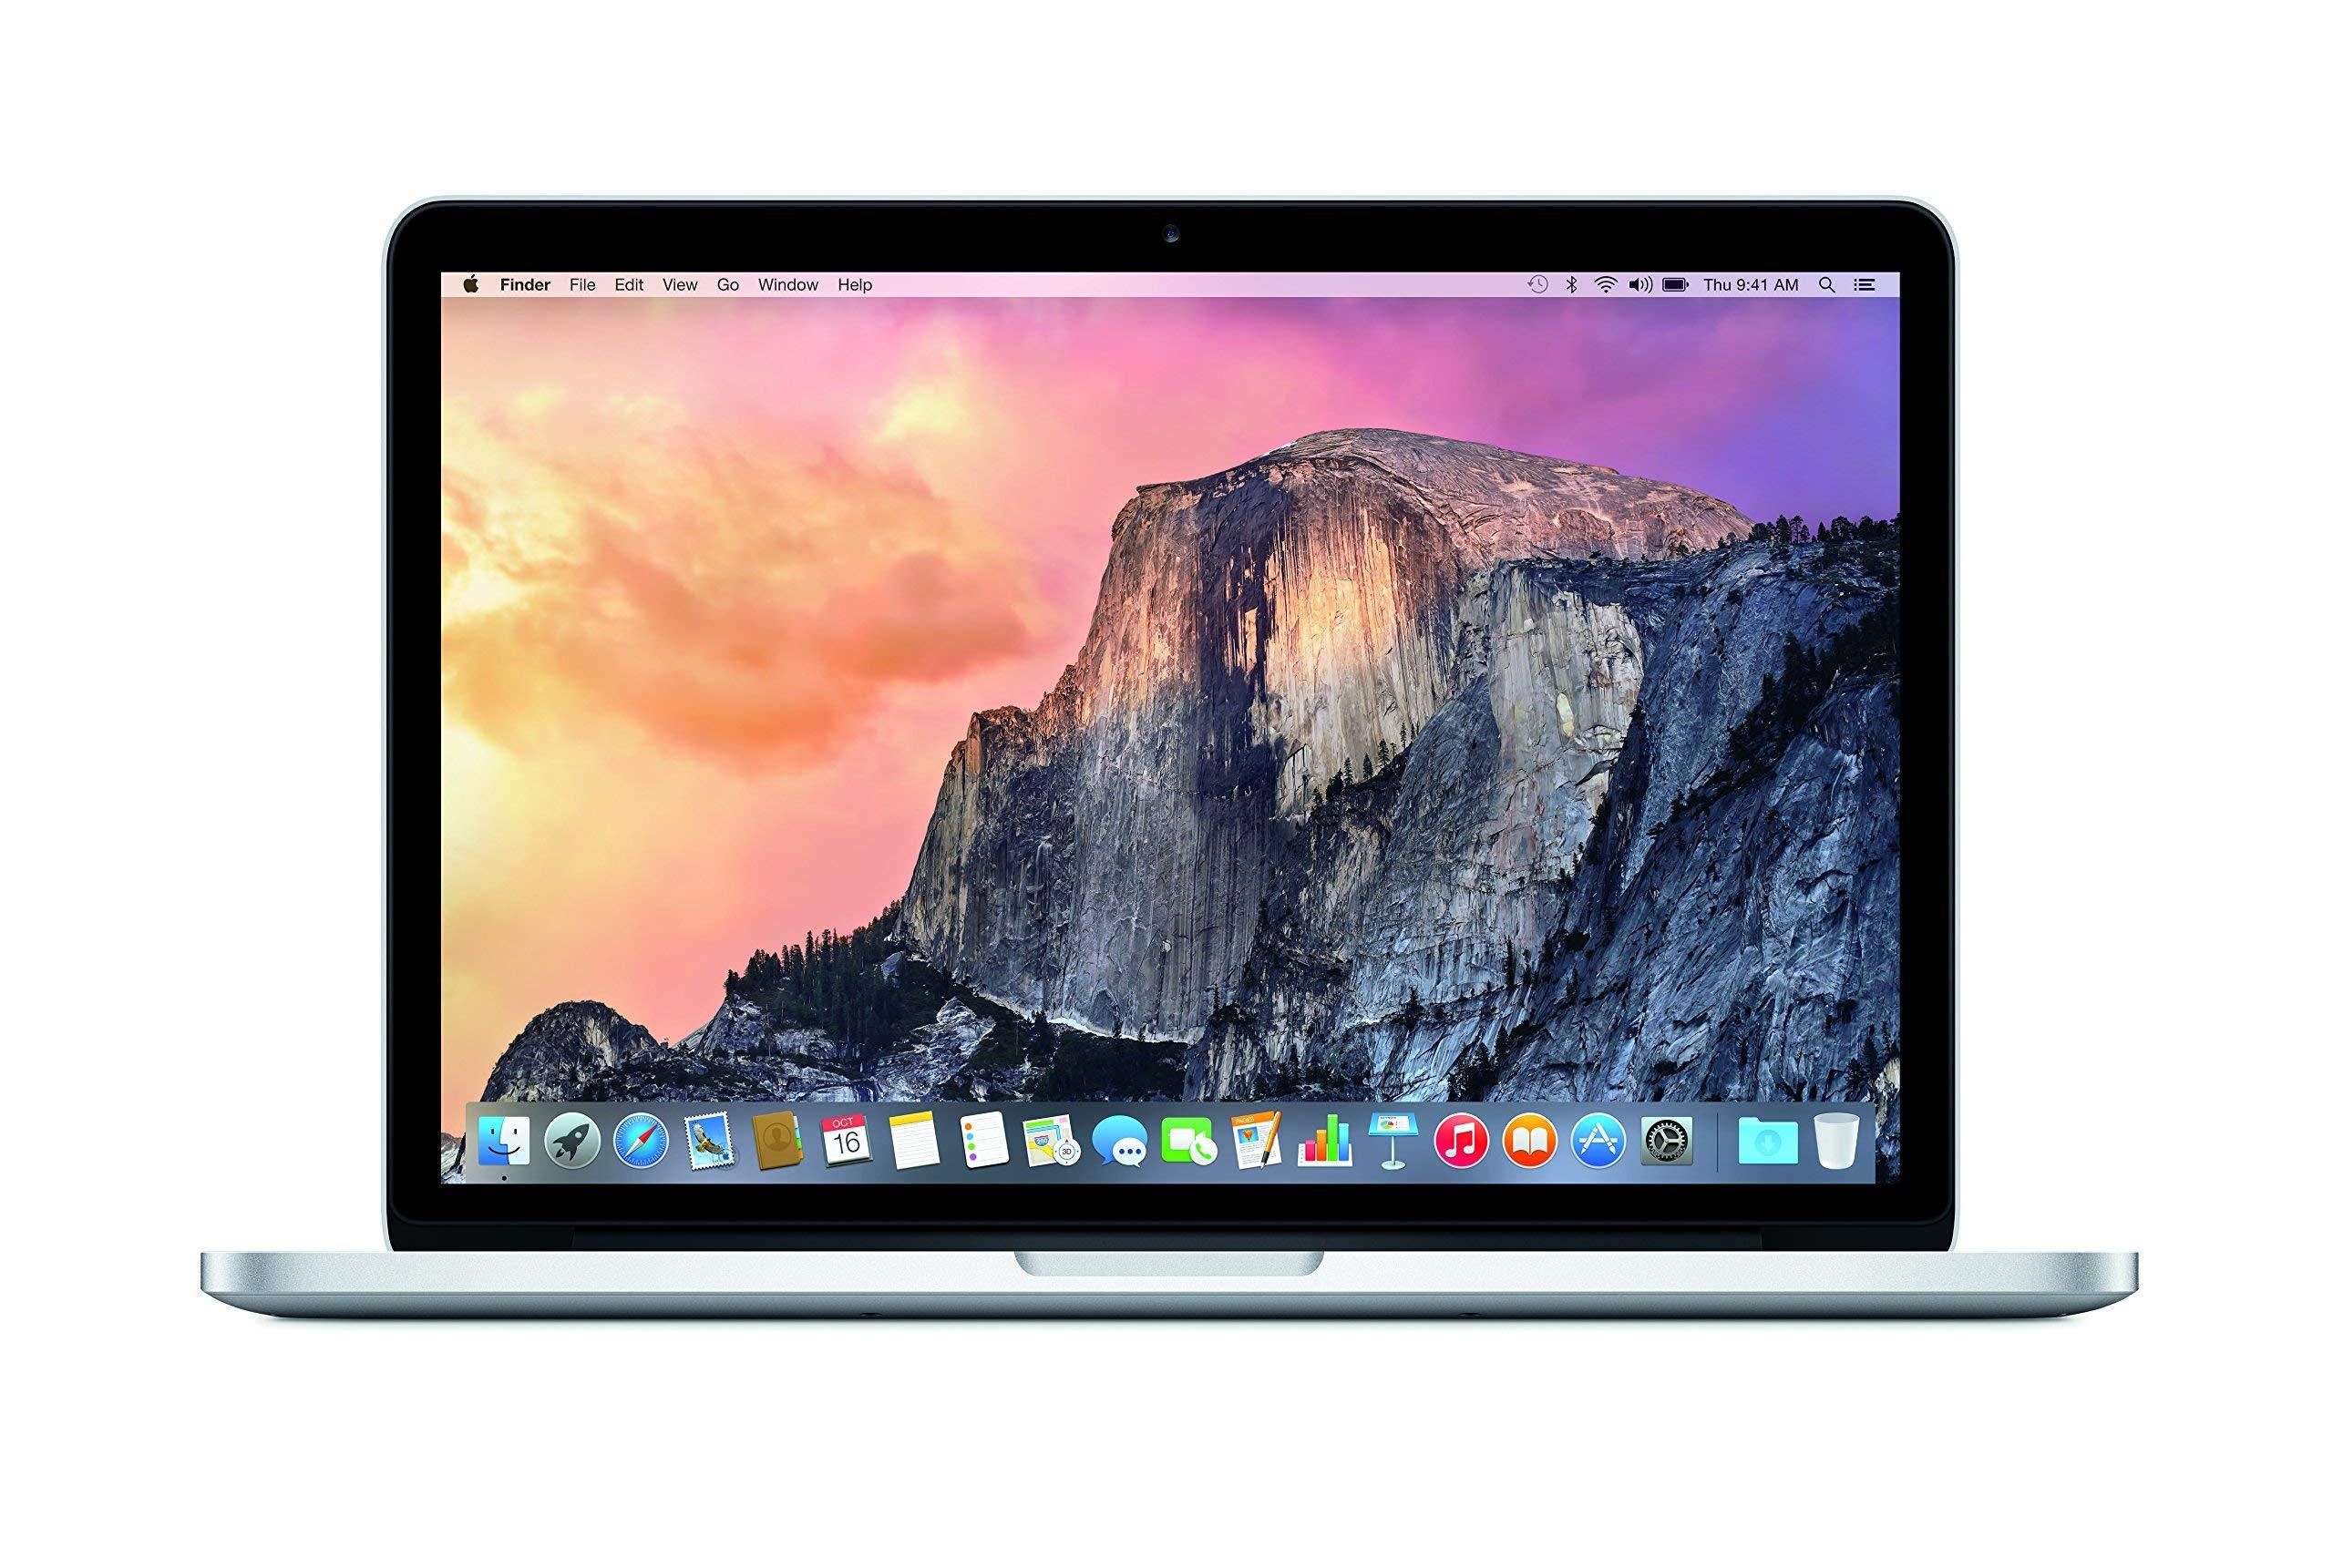 Apple MacBook Pro 13″ (Early 2015) – Core i5 2.9 GHz, 8GB RAM, 512GB SSD (Refurbished) 81uTkVCDaLL